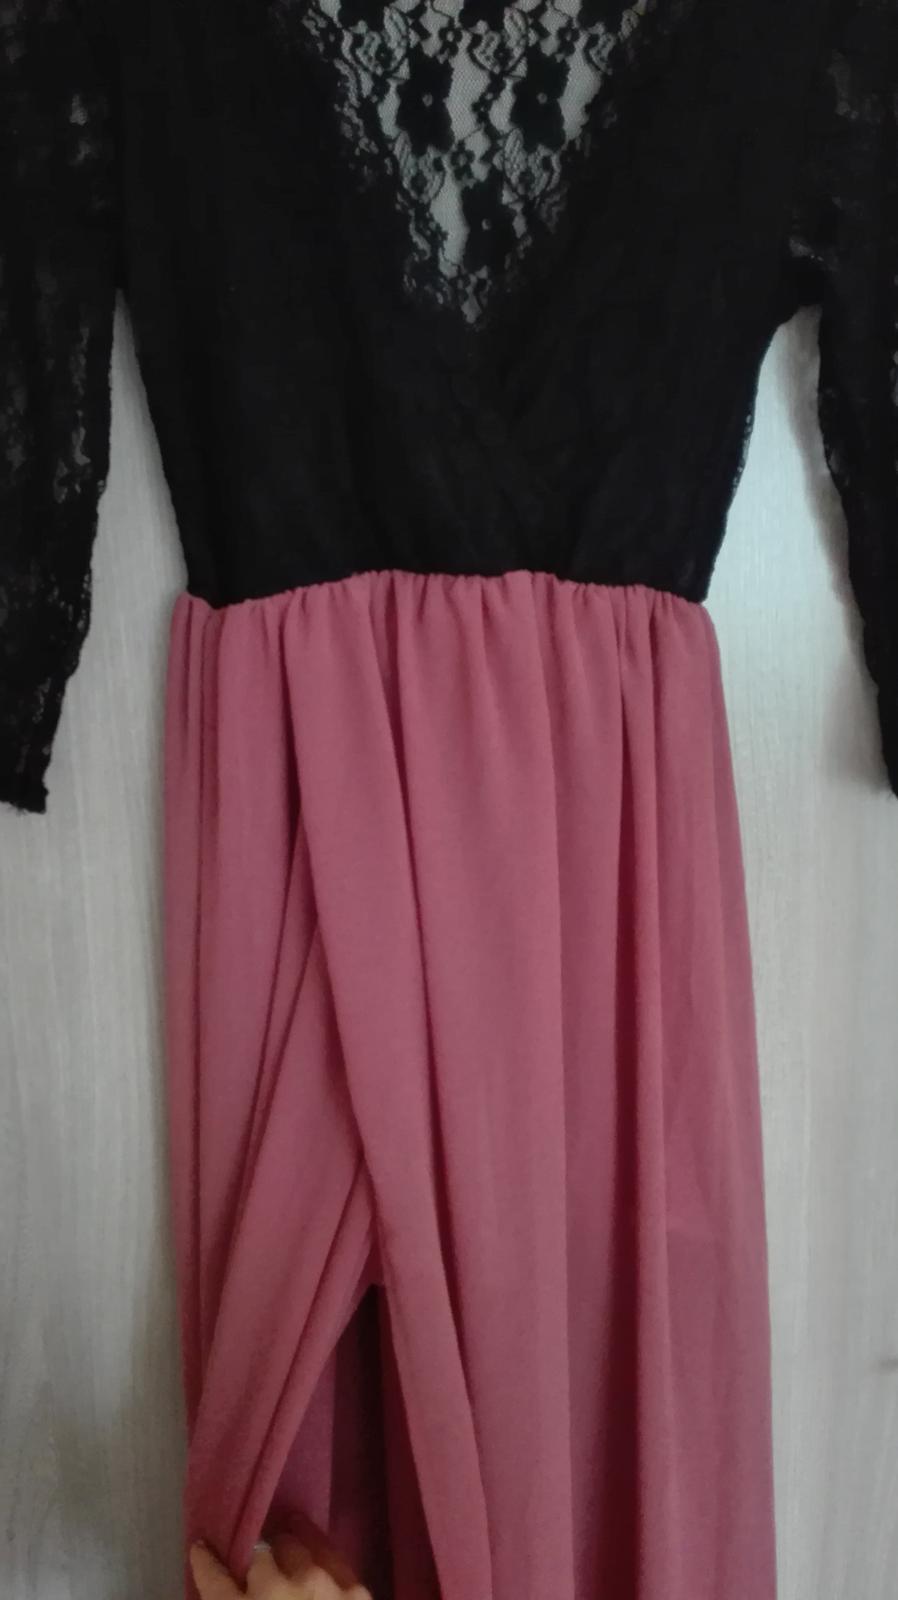 Dámske spoločenské šaty eddc193284f